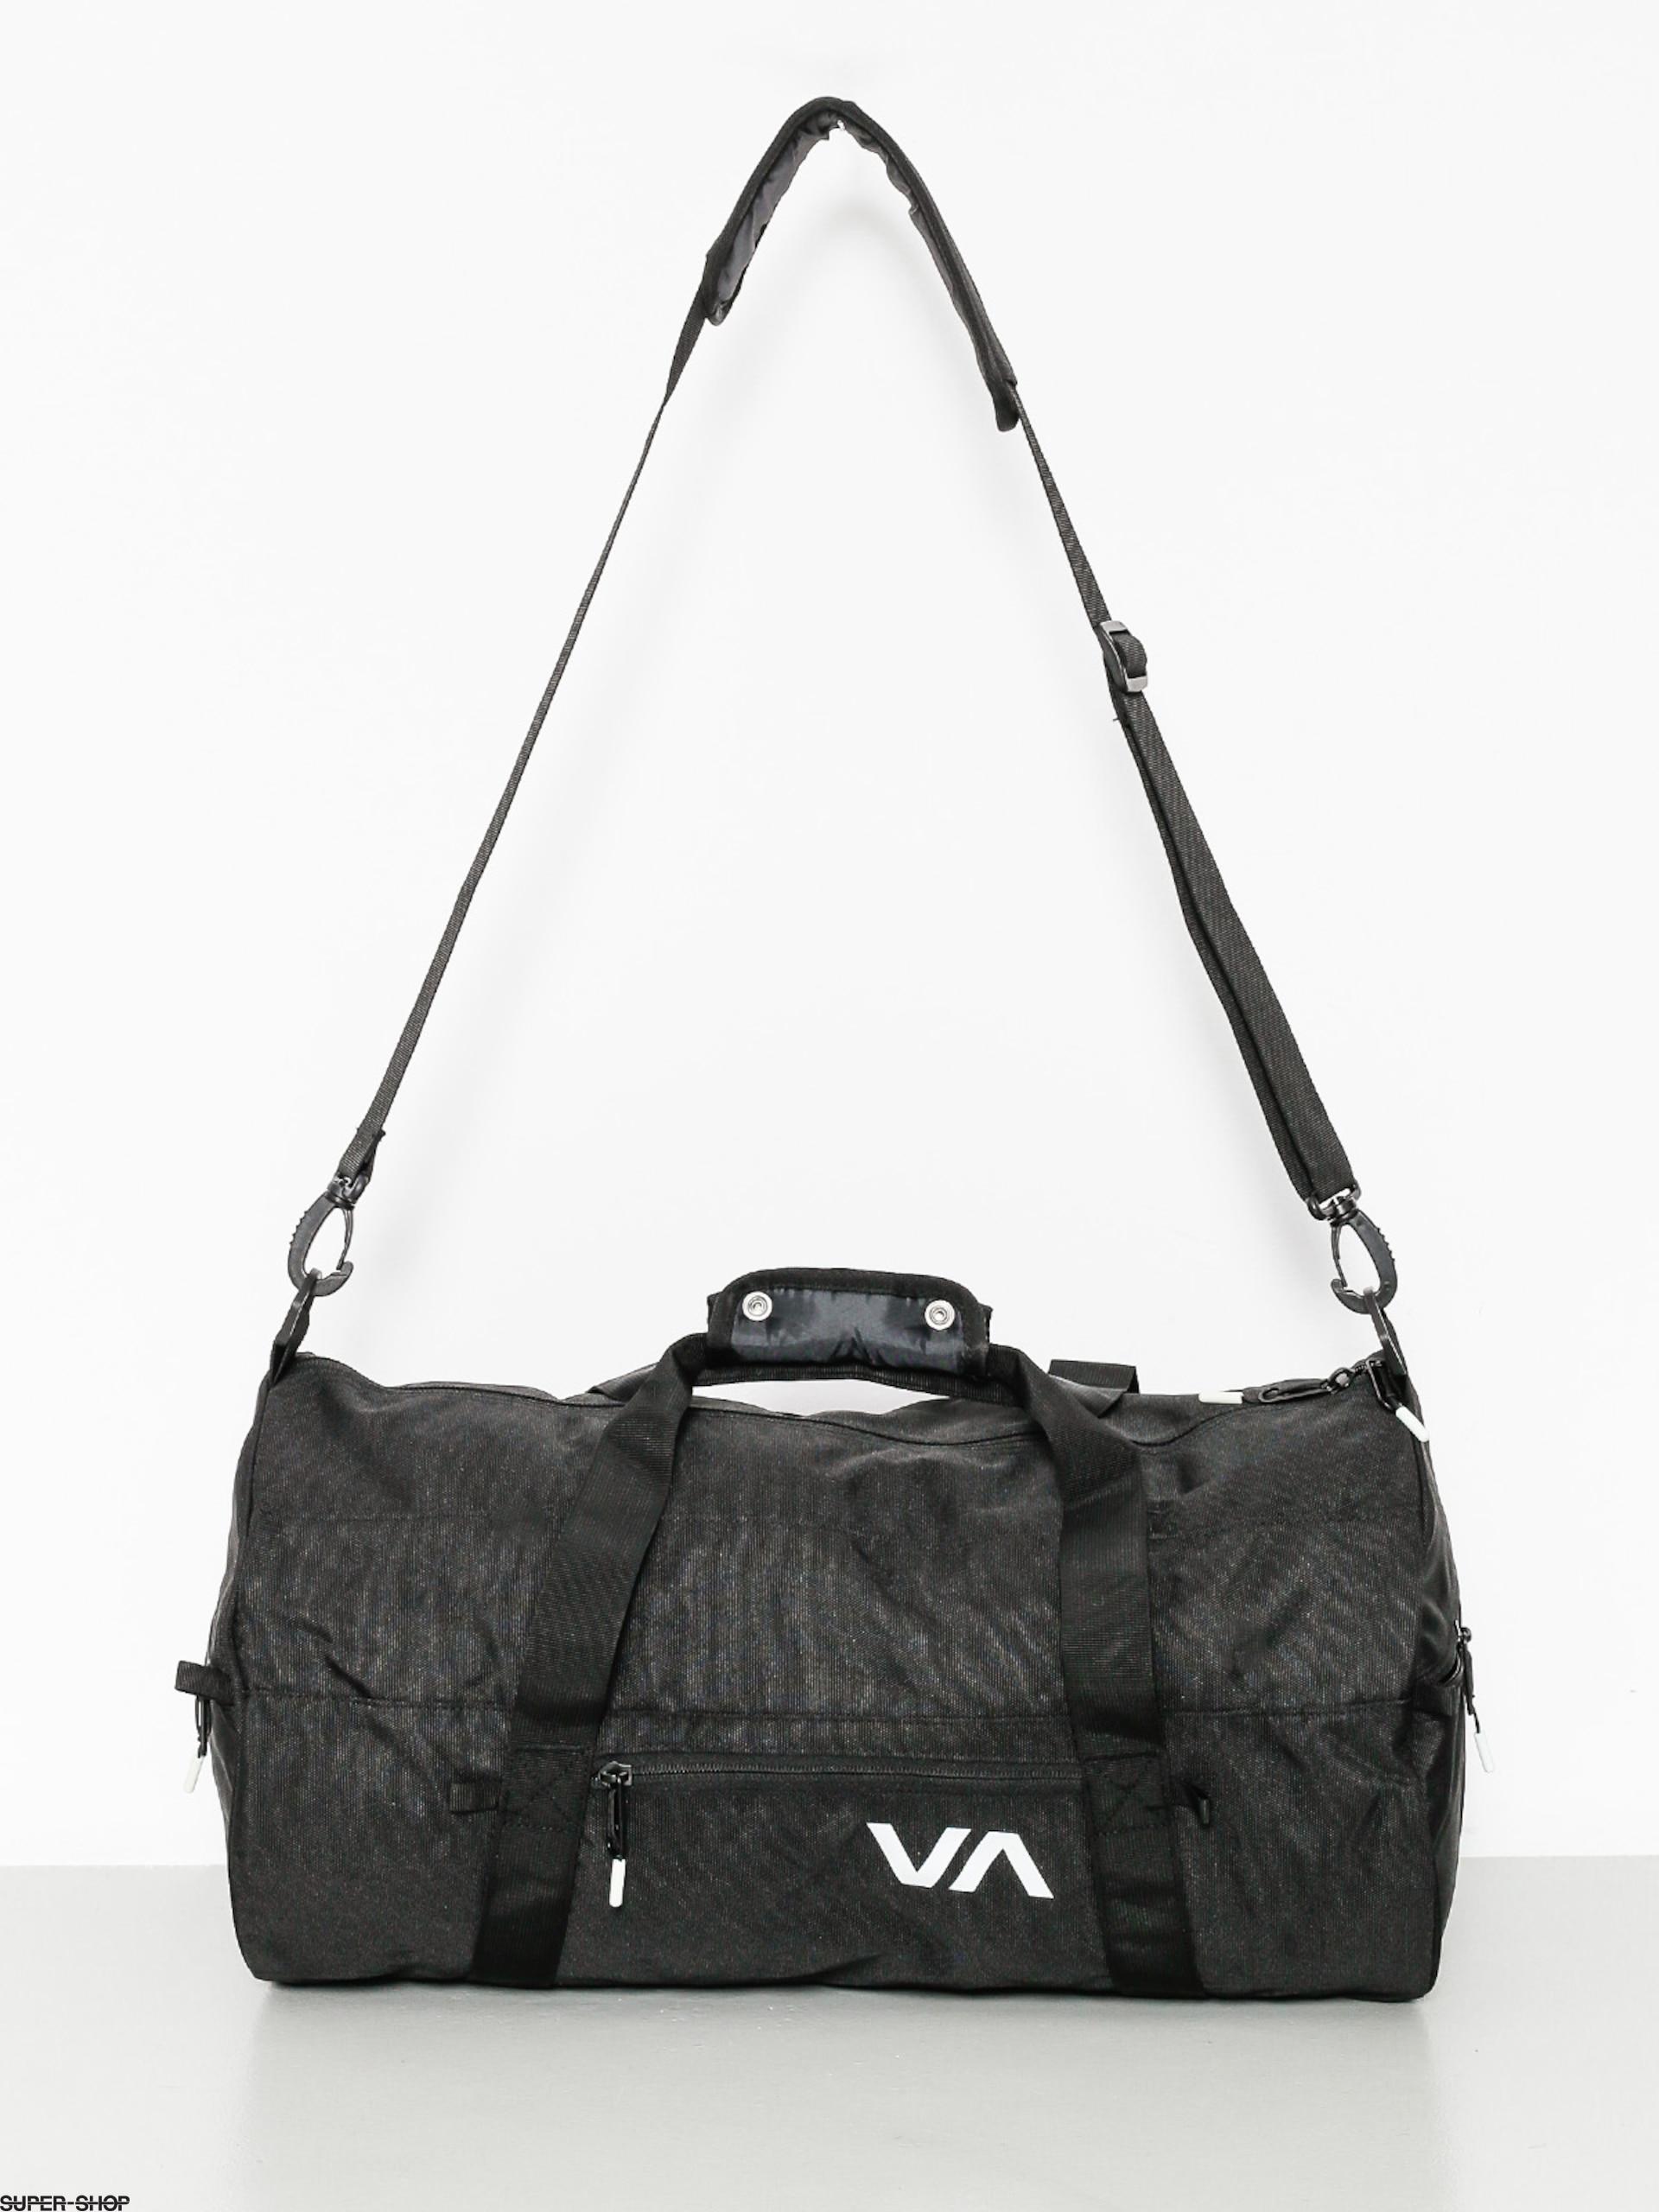 941875-w1920-rvca-bag-va-sport-gym-duffel-black.jpg fd1ae600bdbad